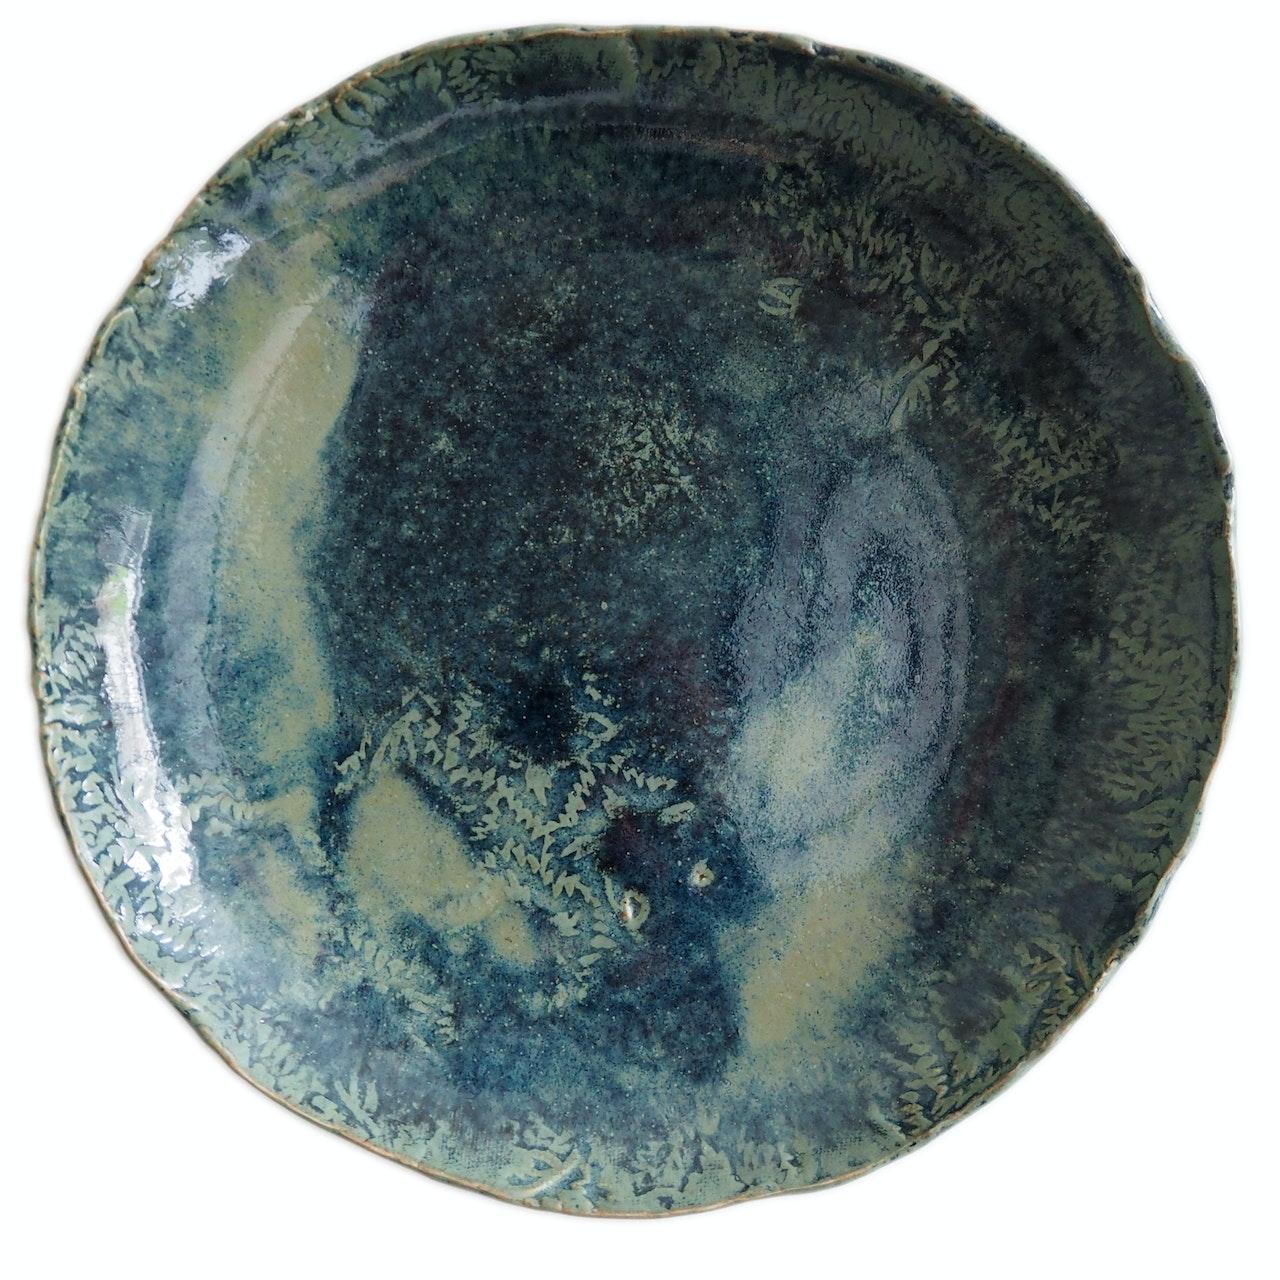 Copper leaf plate